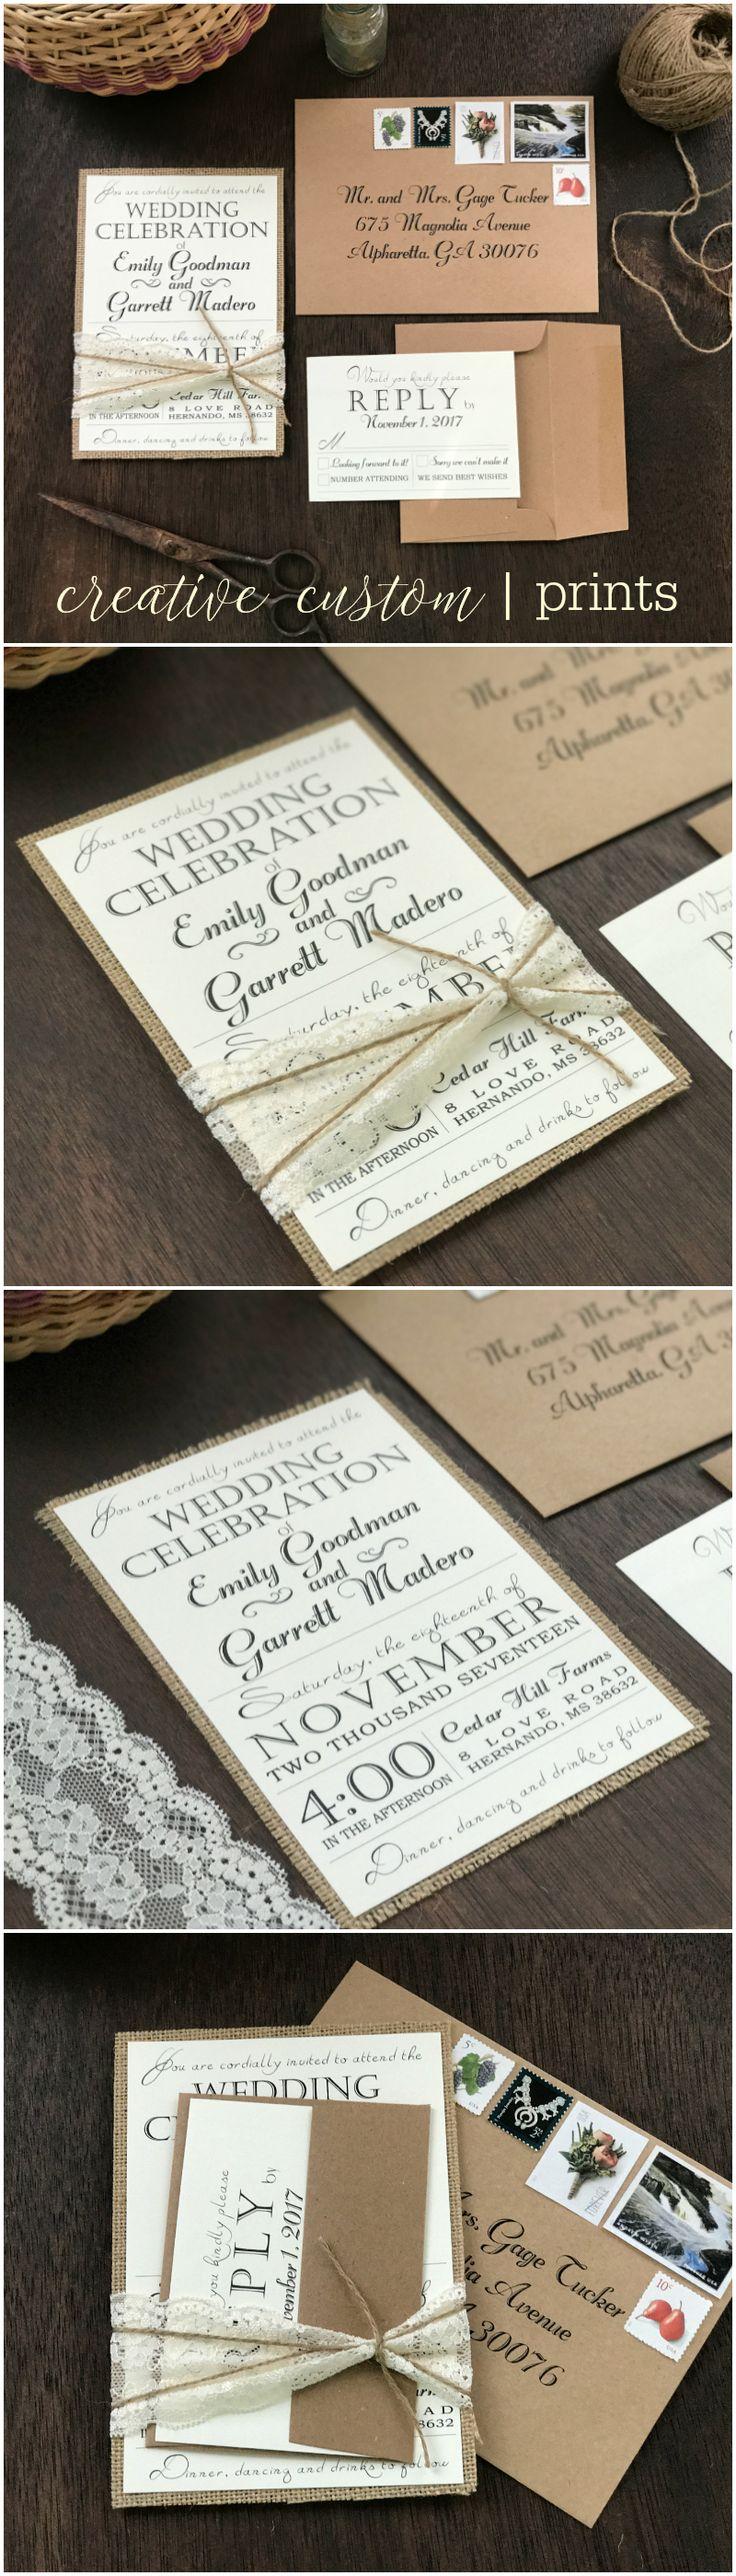 handwrite or print wedding invitation envelopes%0A Rustic Wedding Invitation Set Vintage Wedding Invitation Lace Wedding  Invitation Burlap Wedding Invitation